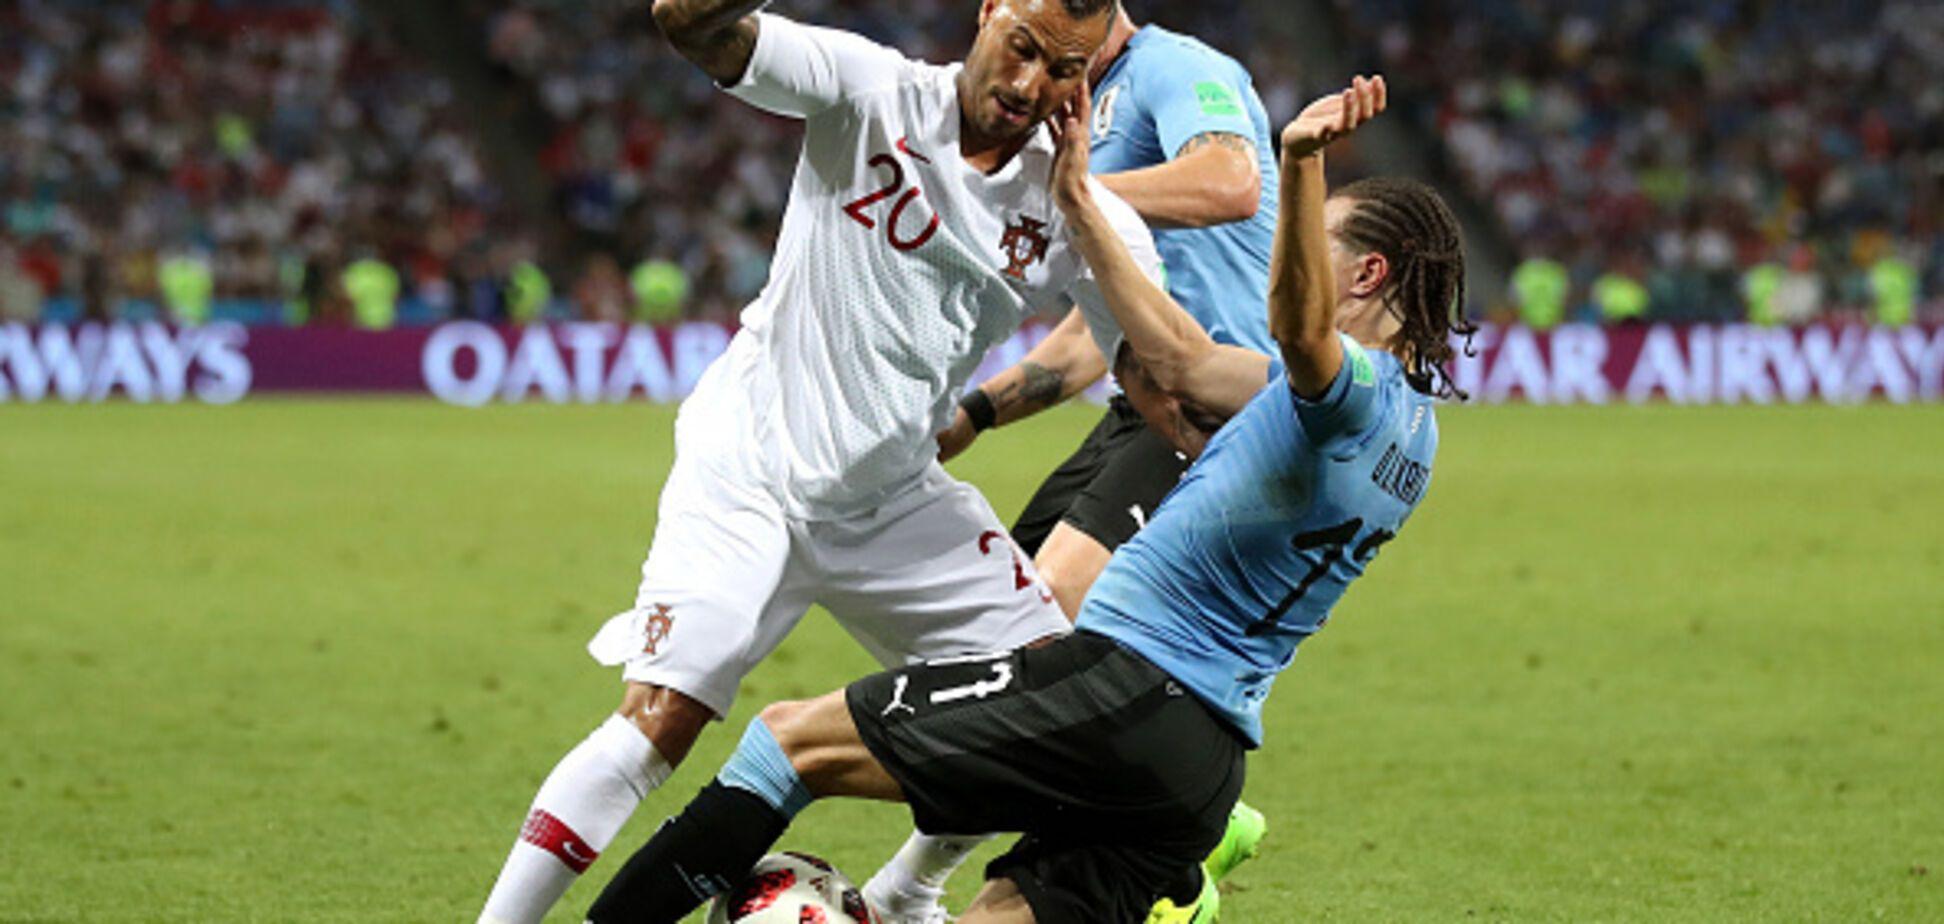 Португалія - Уругвай: огляд 1/8 фіналу ЧС-2018